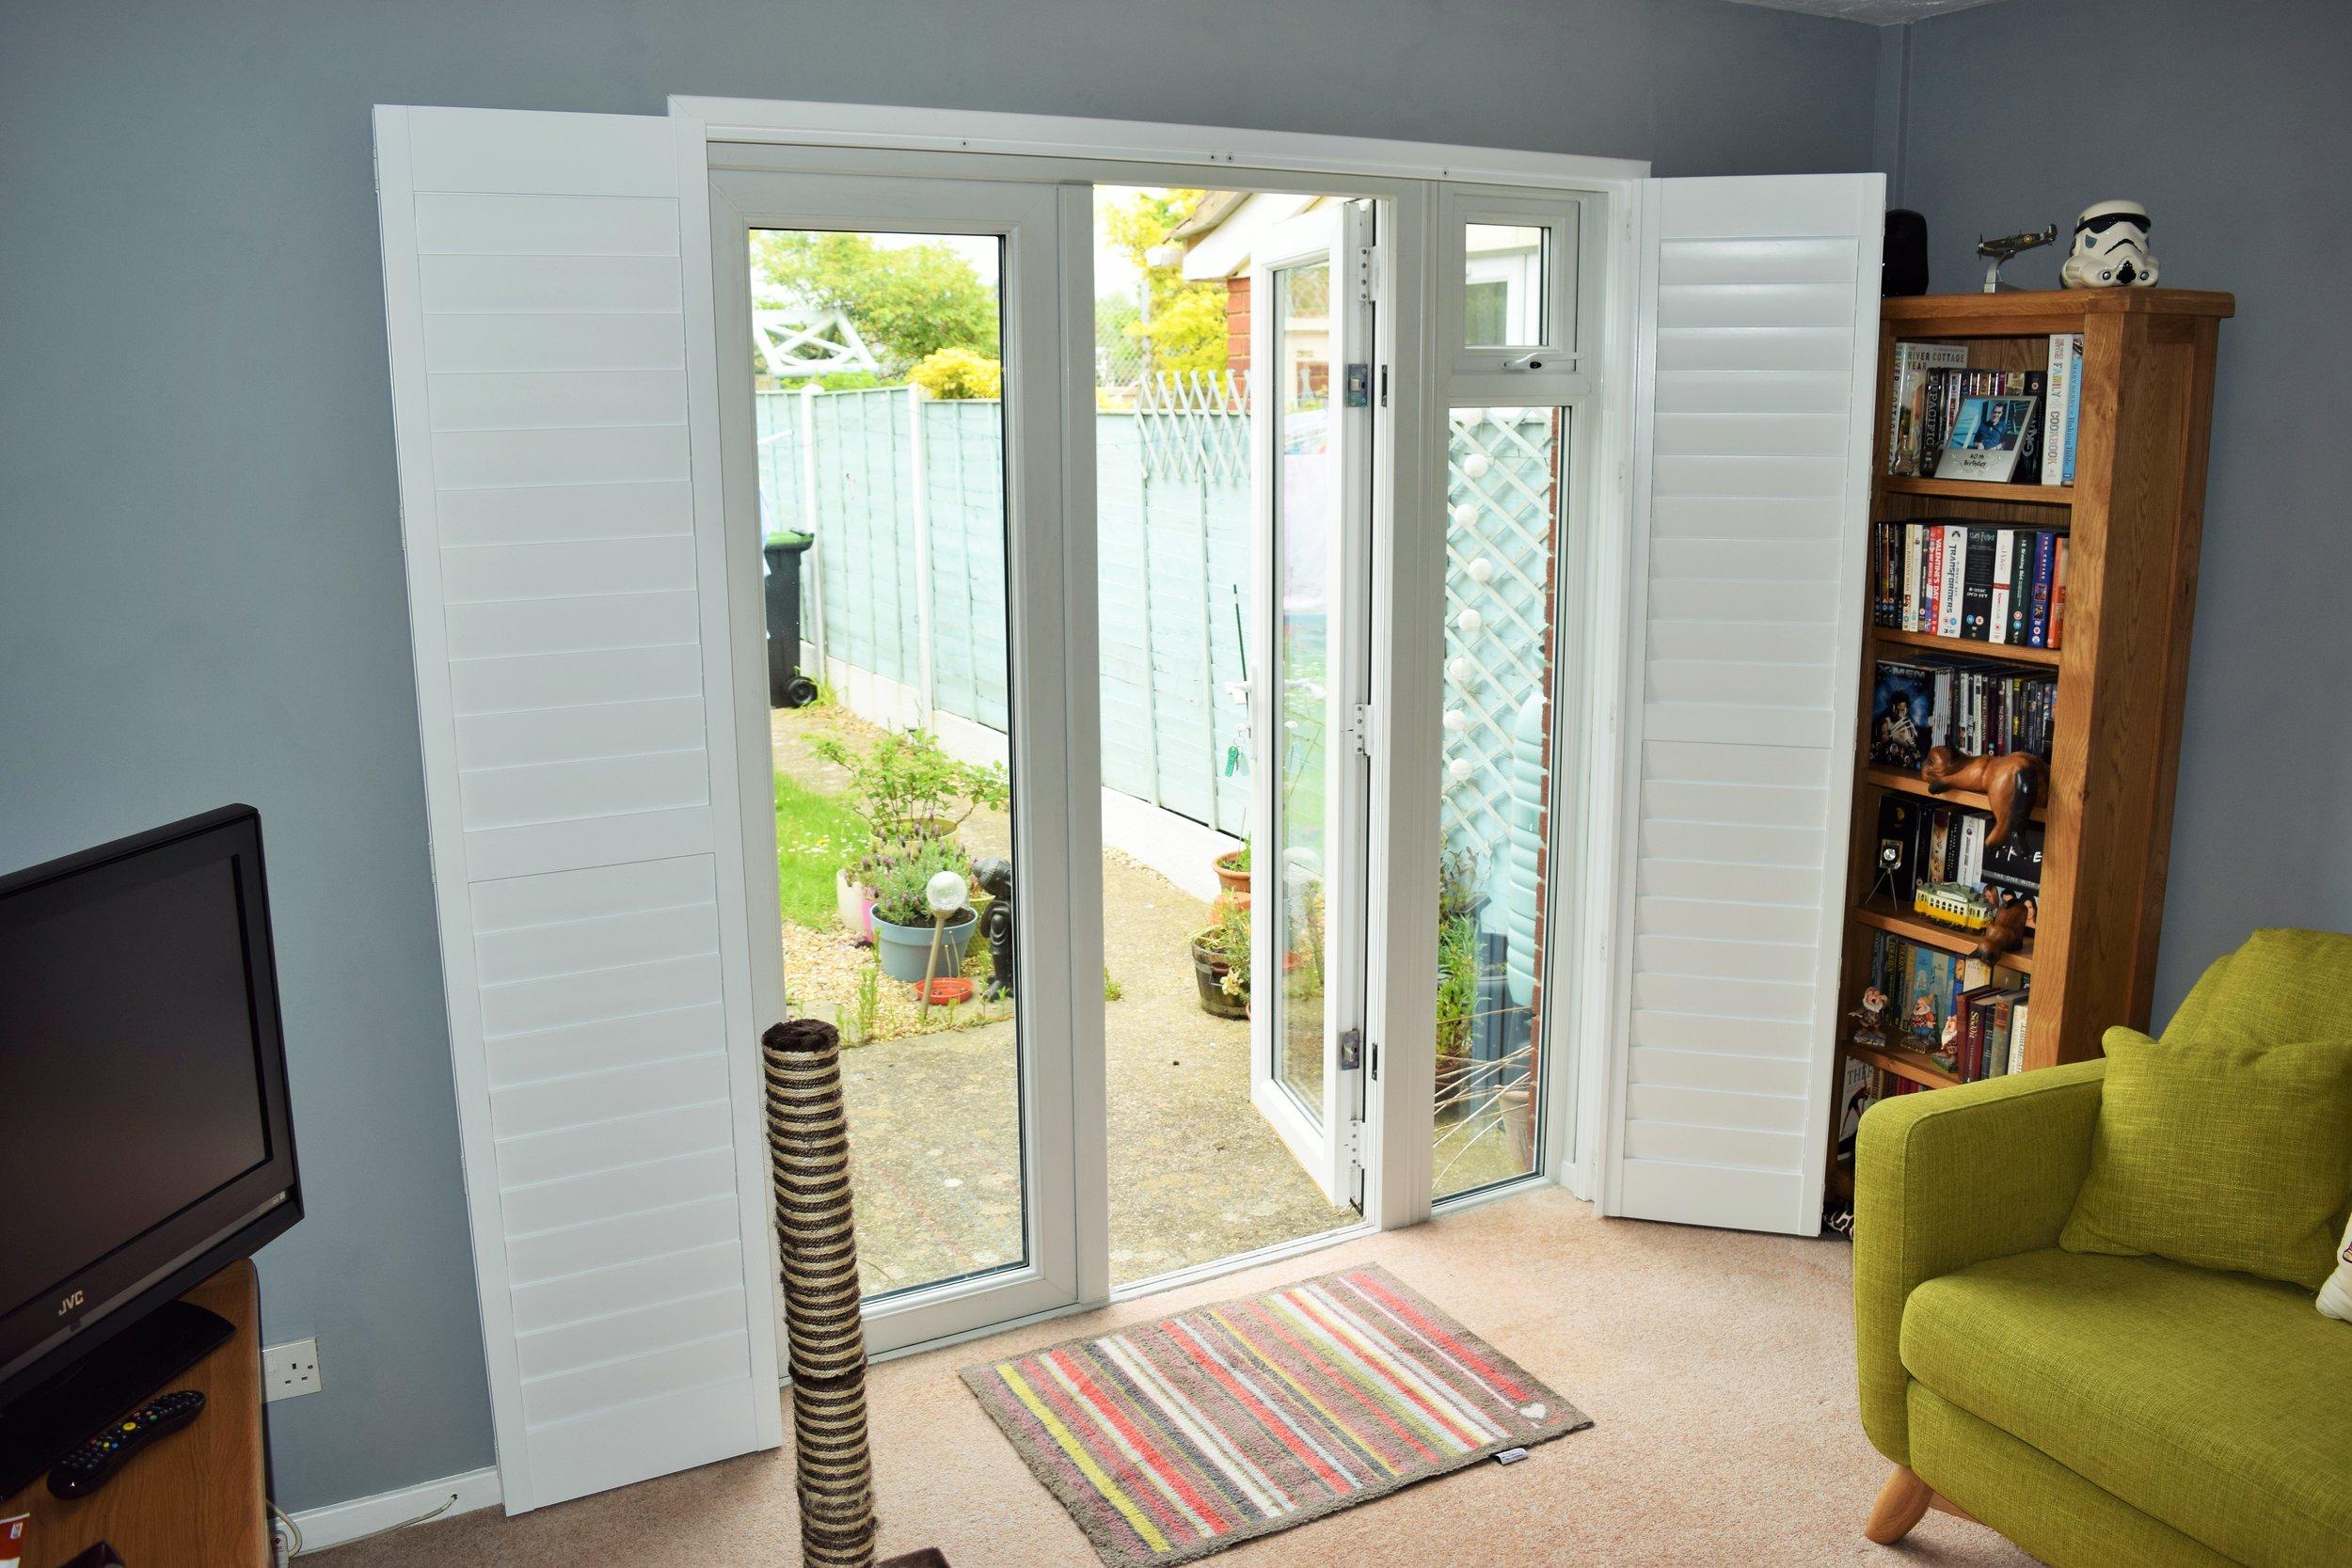 Patio door shutters Ringwood, Ferndown, Bournemouth, Dorset